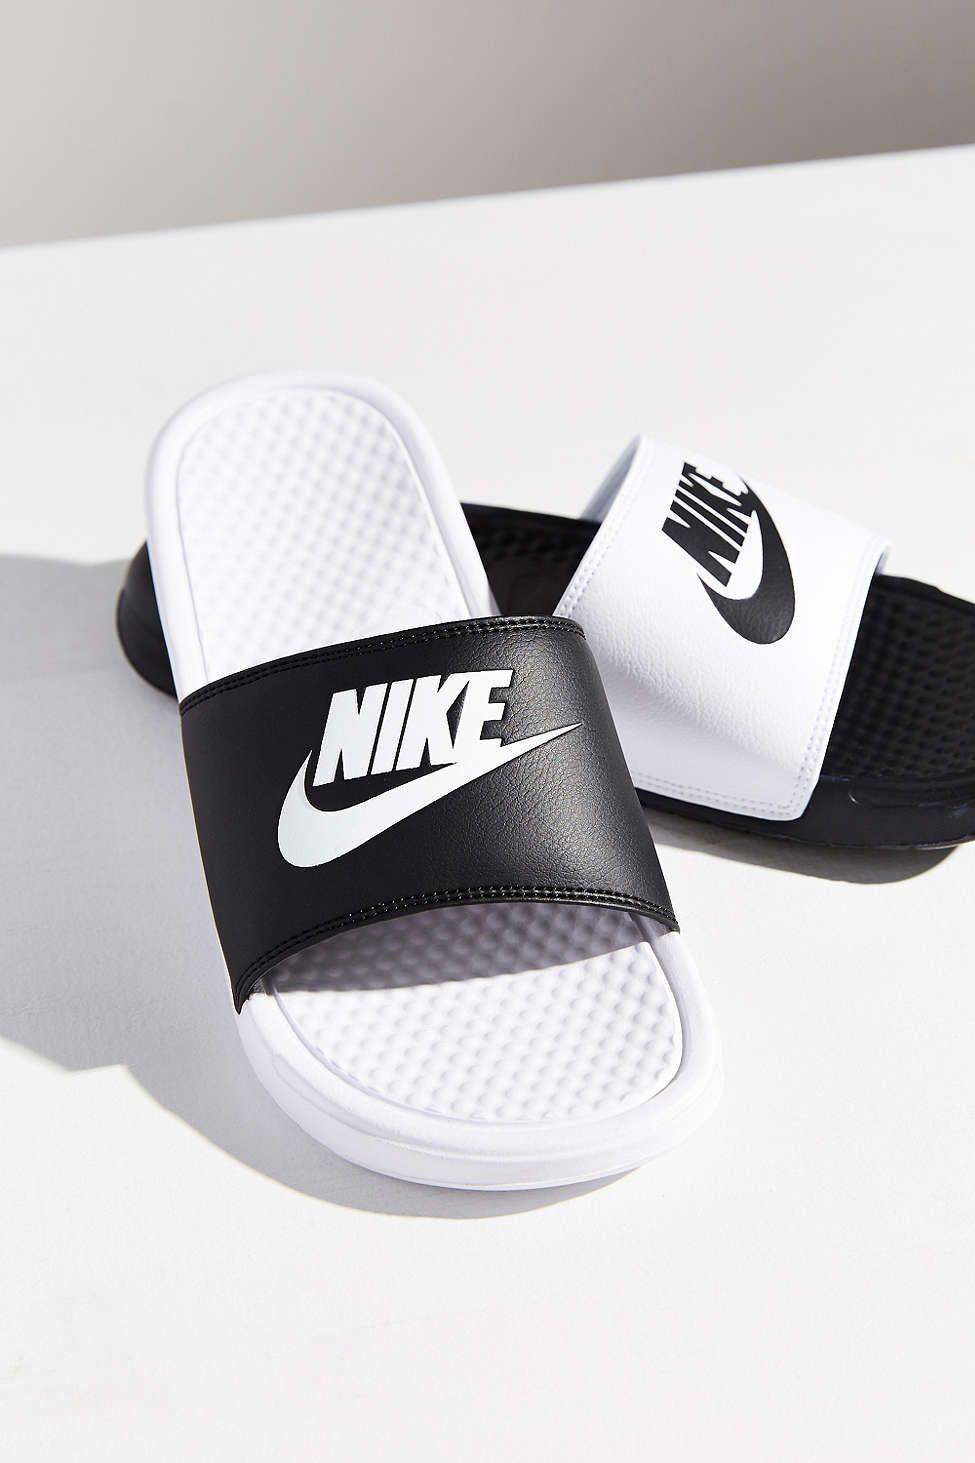 Nike Benassi JDI Mismatch Slide - Urban Outfitters